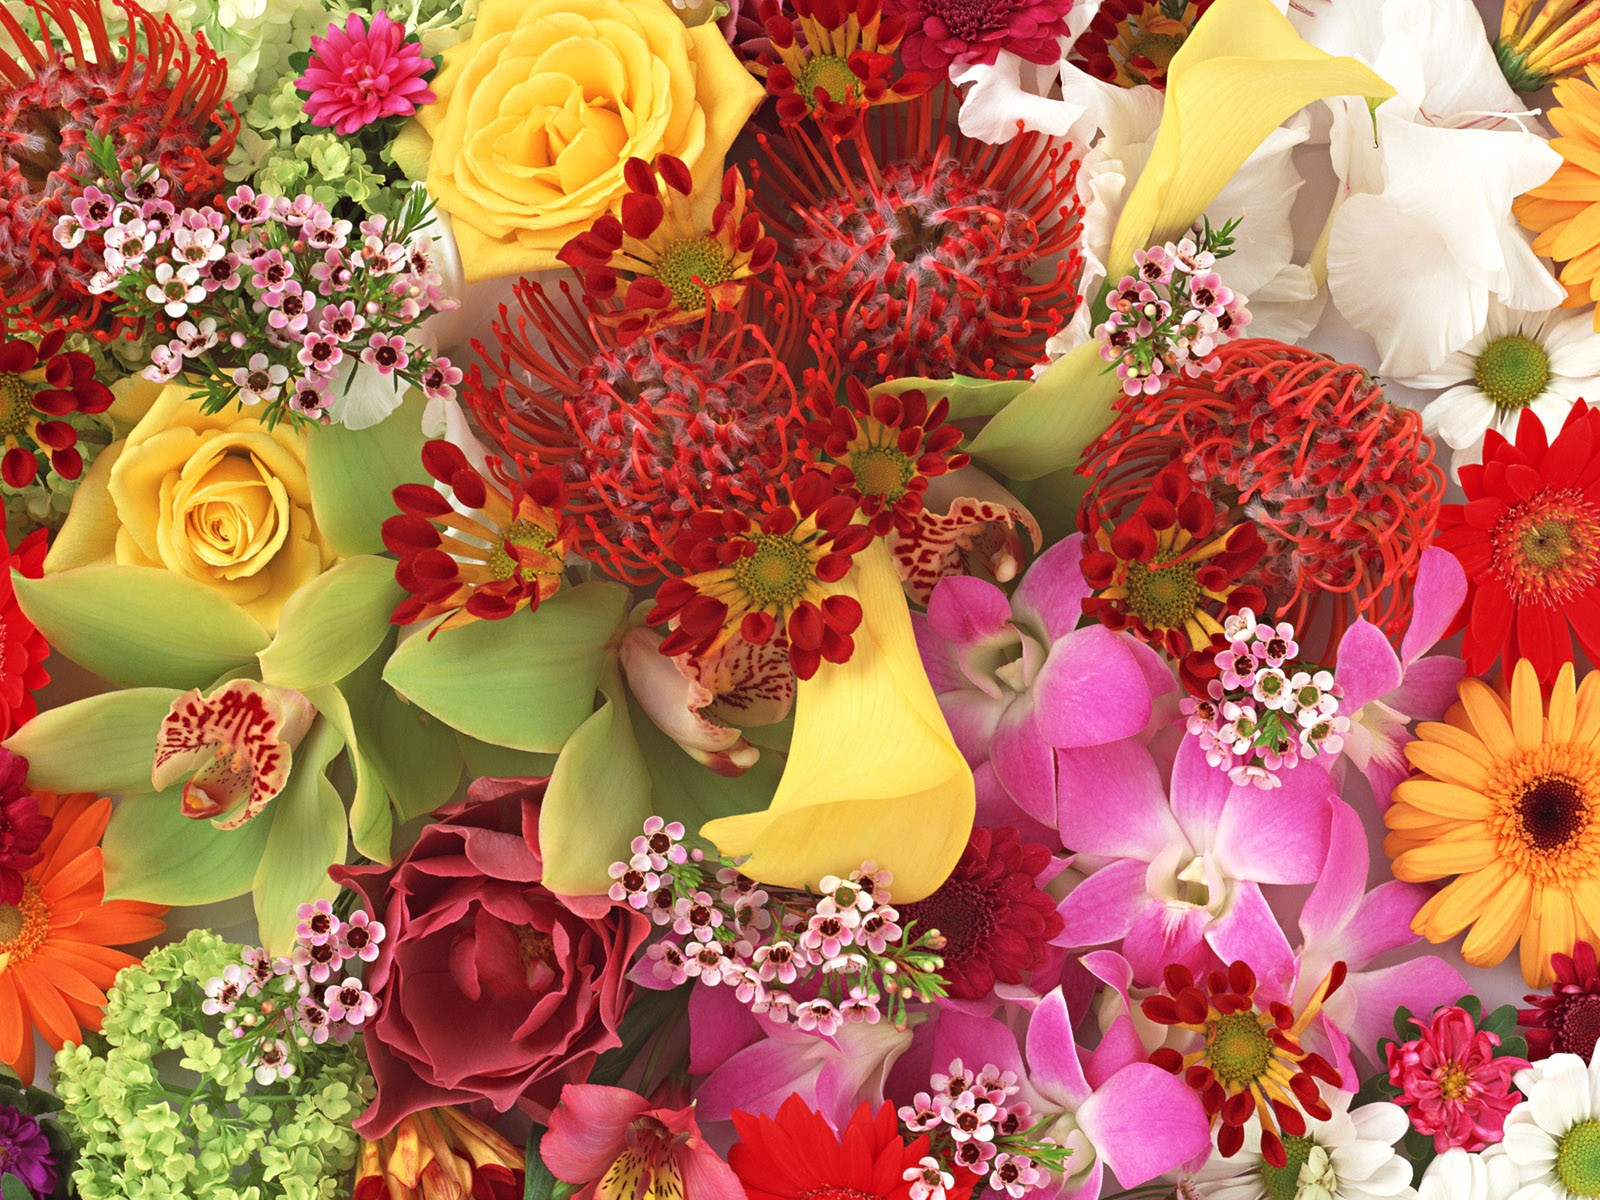 Flower bouquet colorful bouquet rose bouquet for Picture of a bouquet of flowers